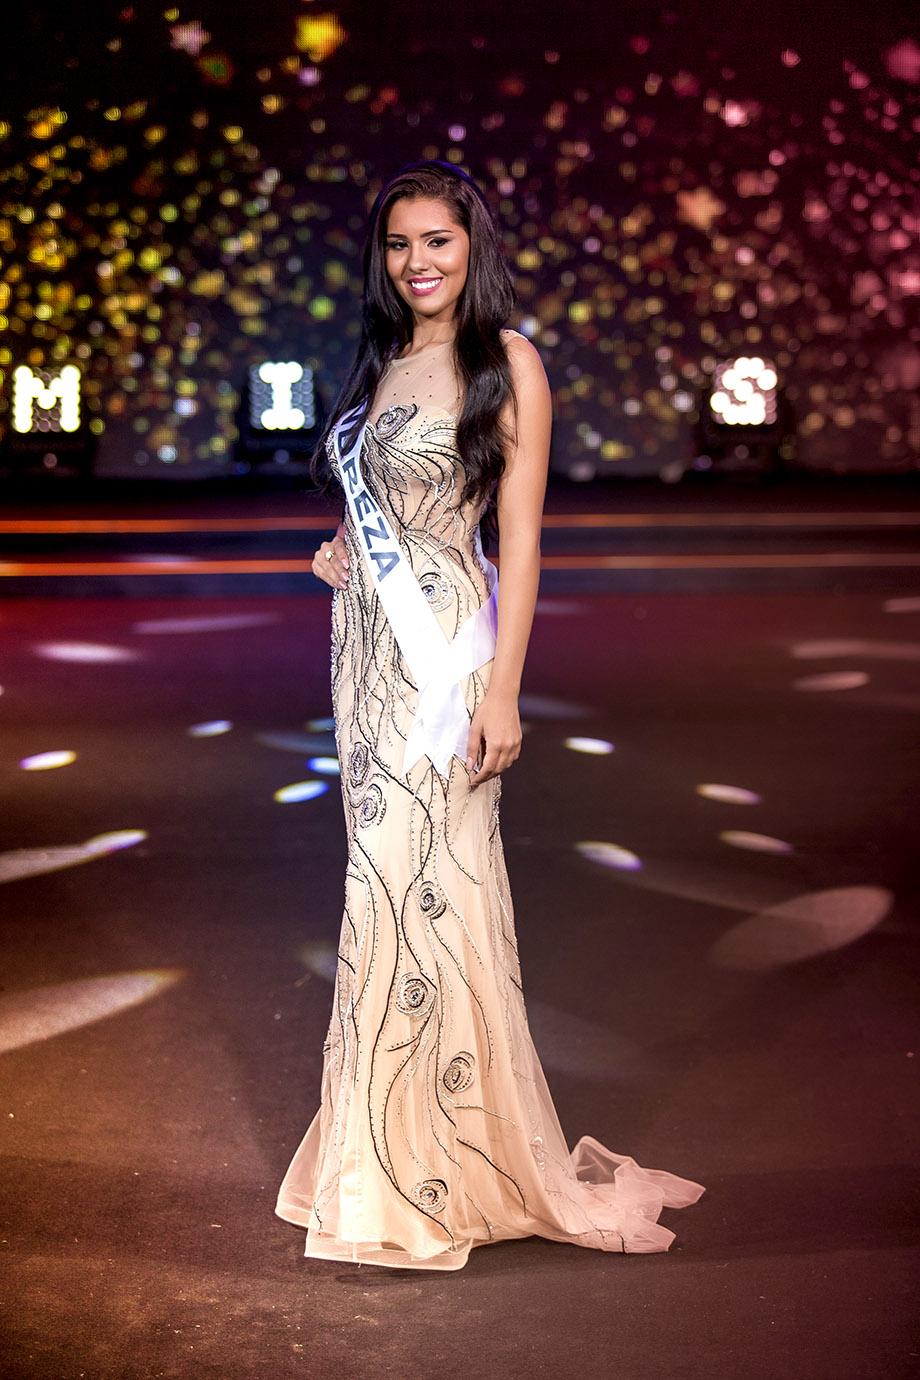 Blog Cris Moreira - Miss Fortaleza 2016 - 16